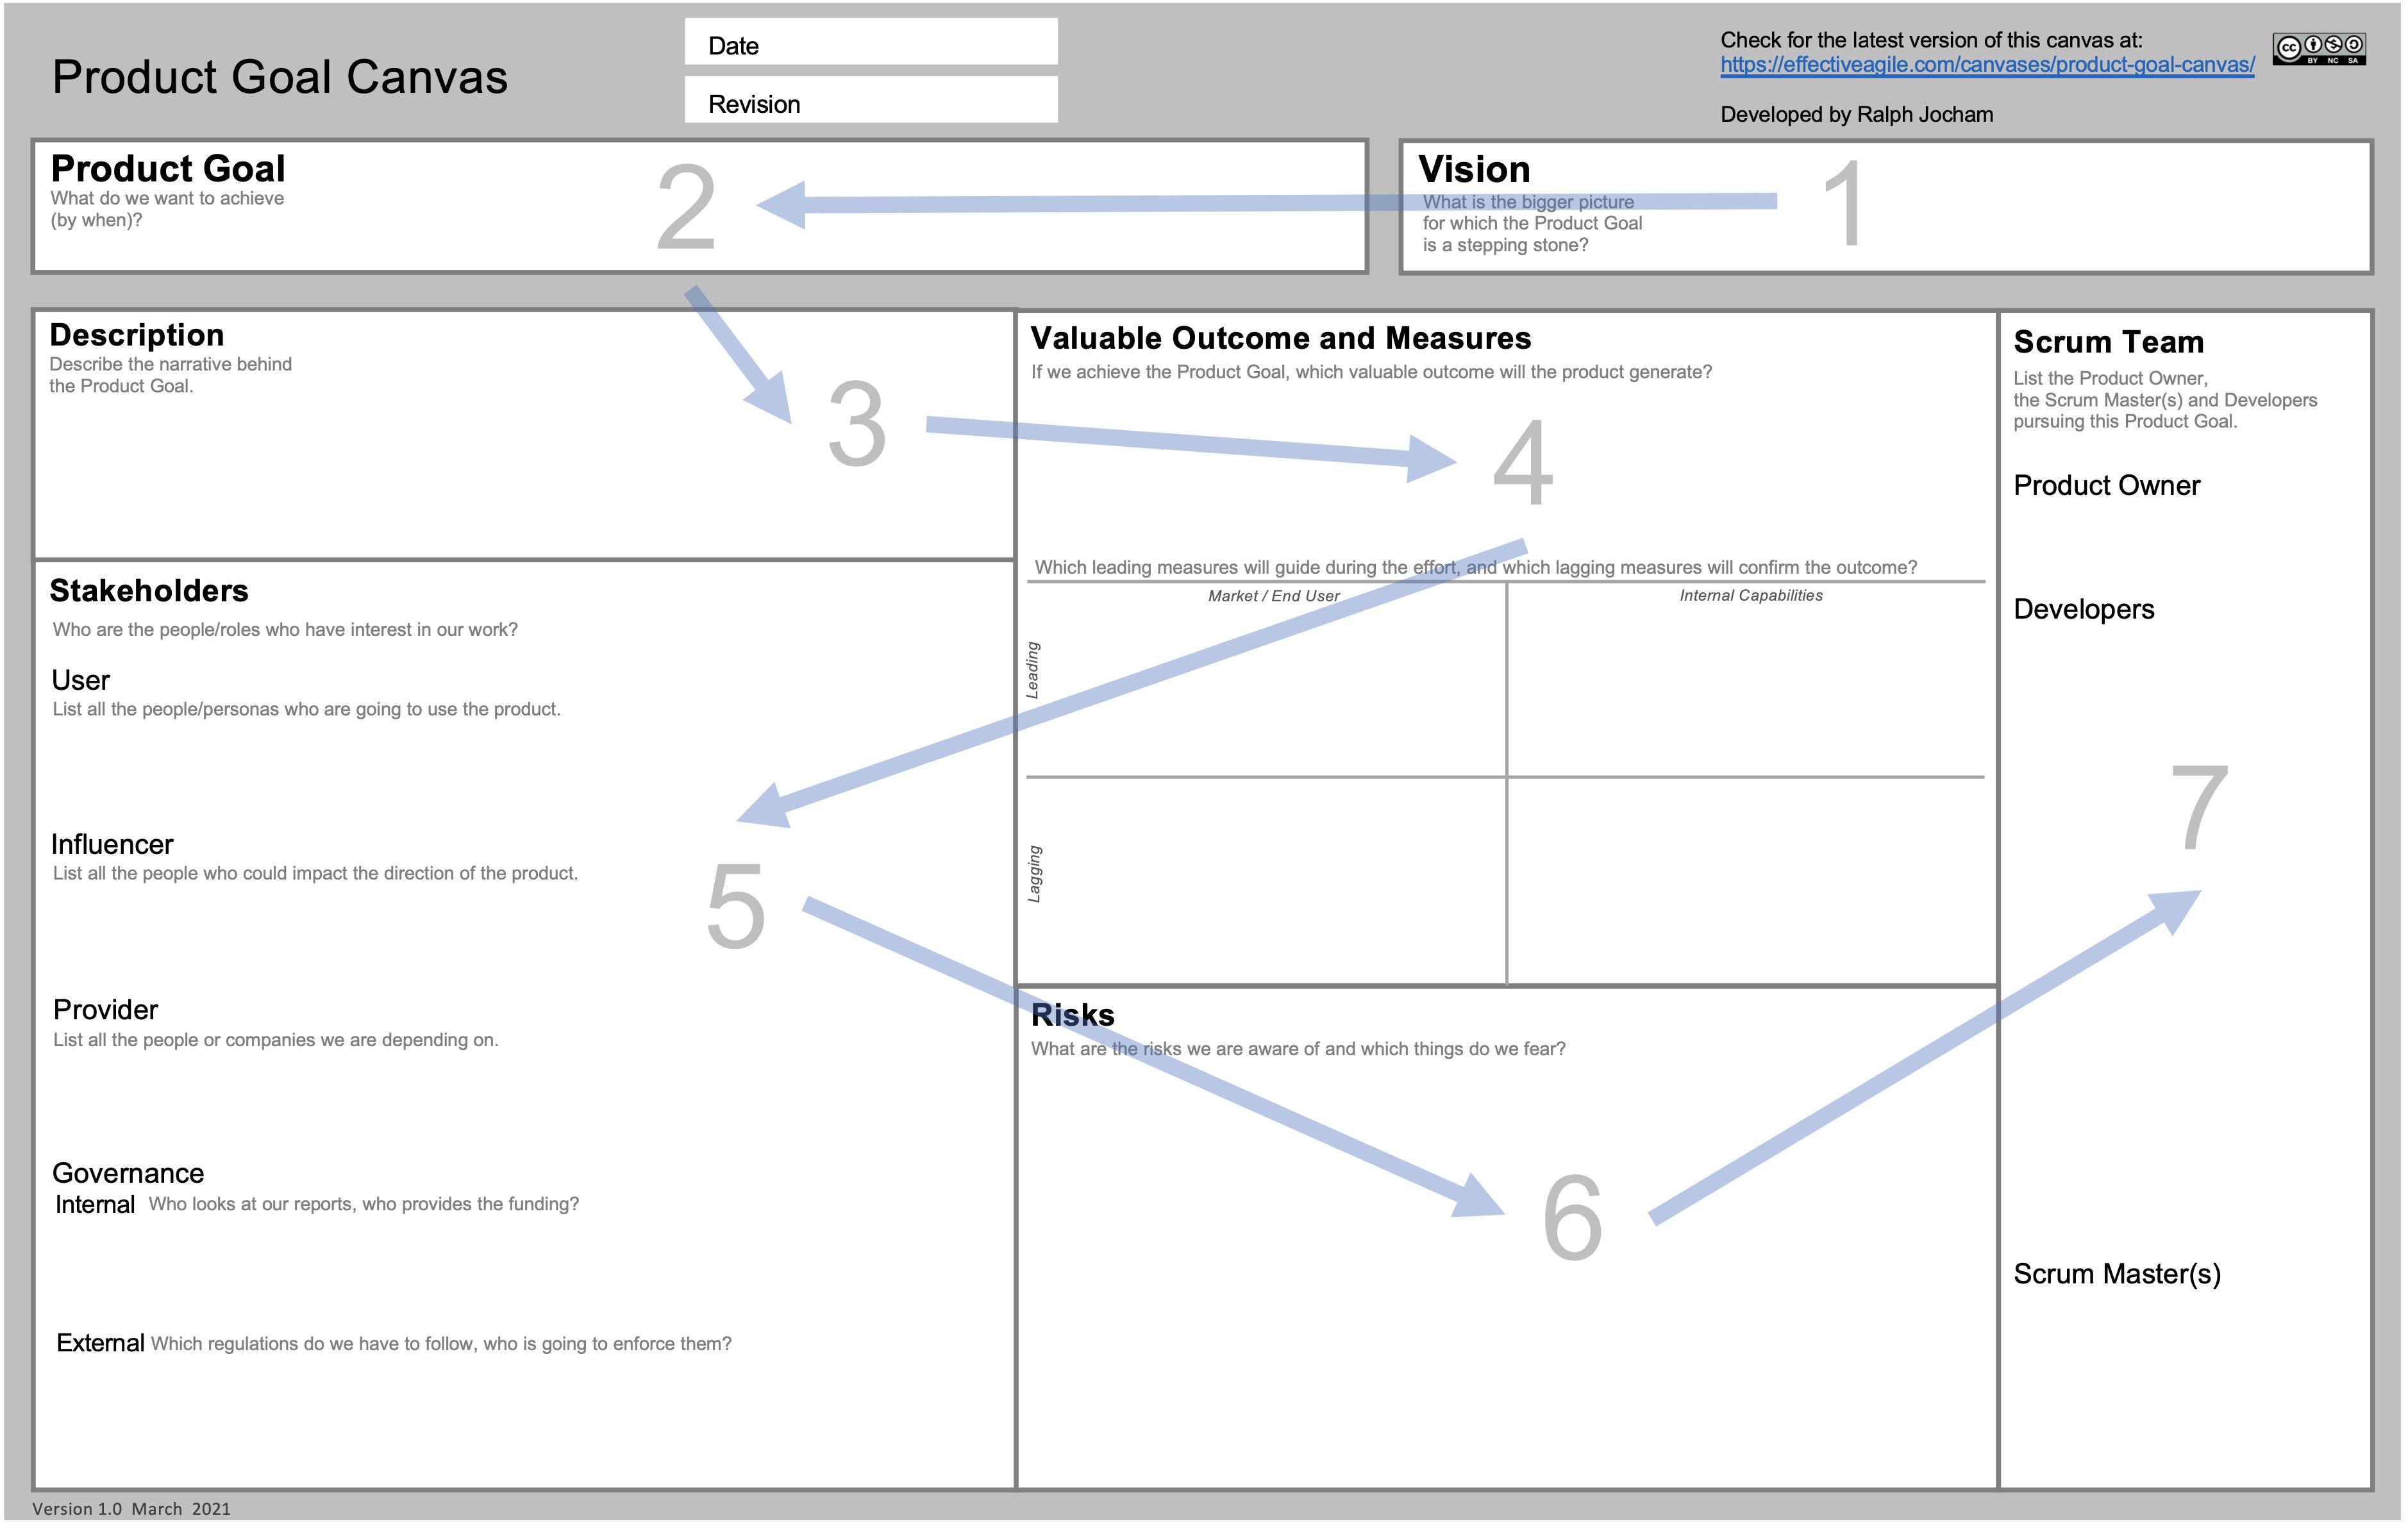 Product Goal Canvas flow